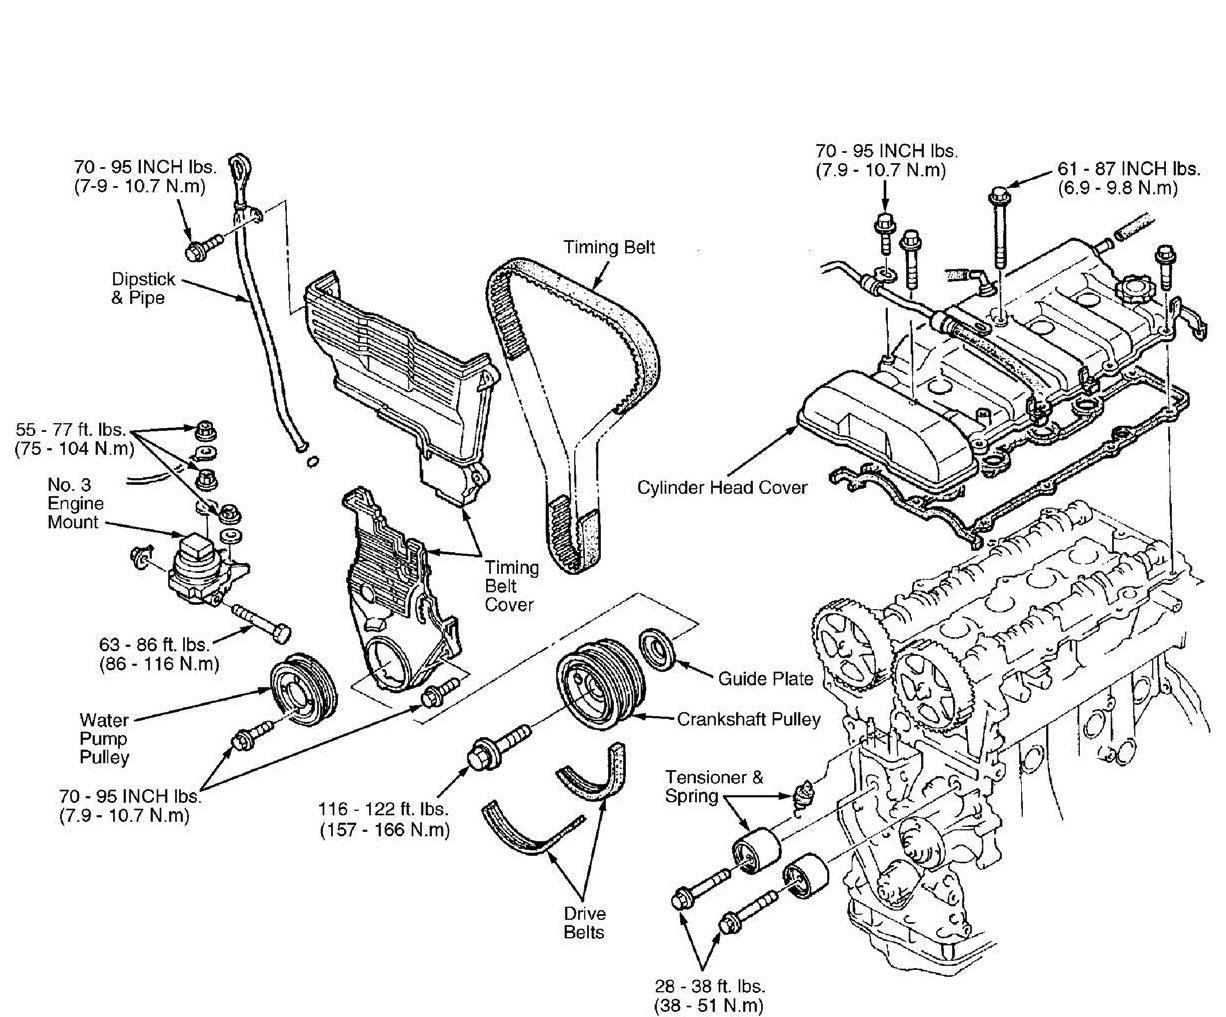 1995 mazda 626 engine diagram - wiring diagram tags forge-usage -  forge-usage.discoveriran.it  discoveriran.it